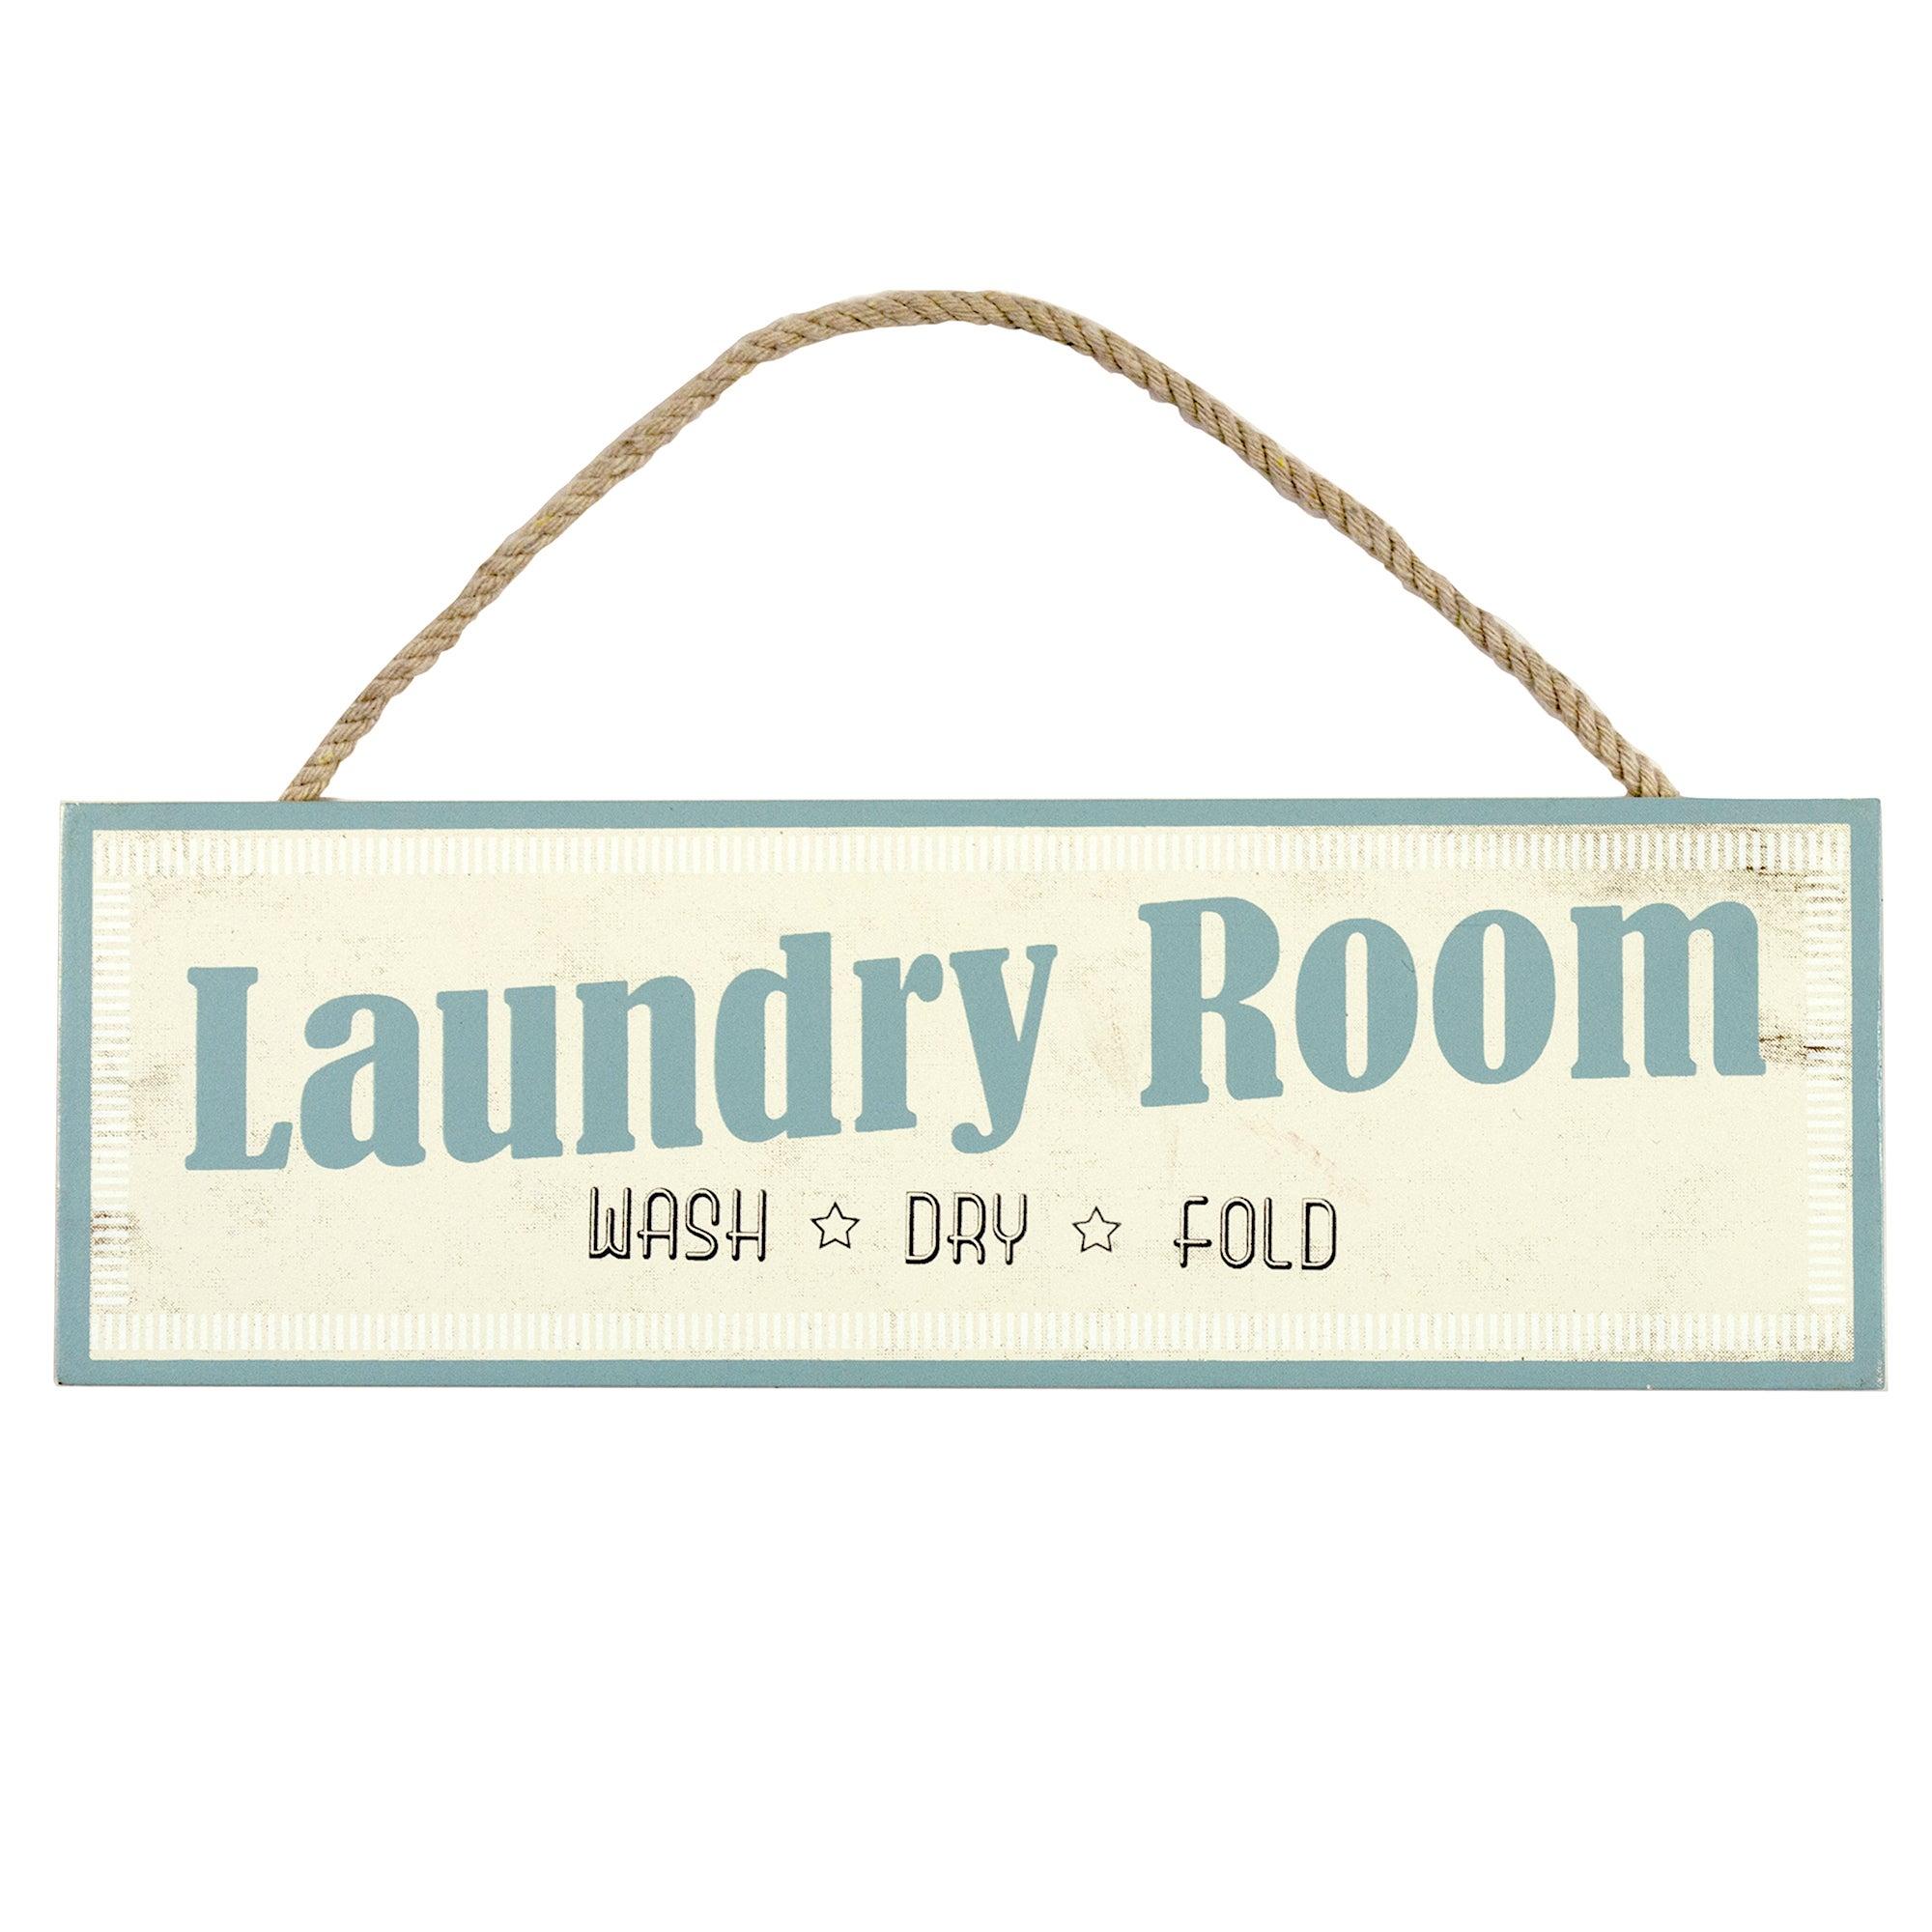 Laundry Room Wooden Plaque